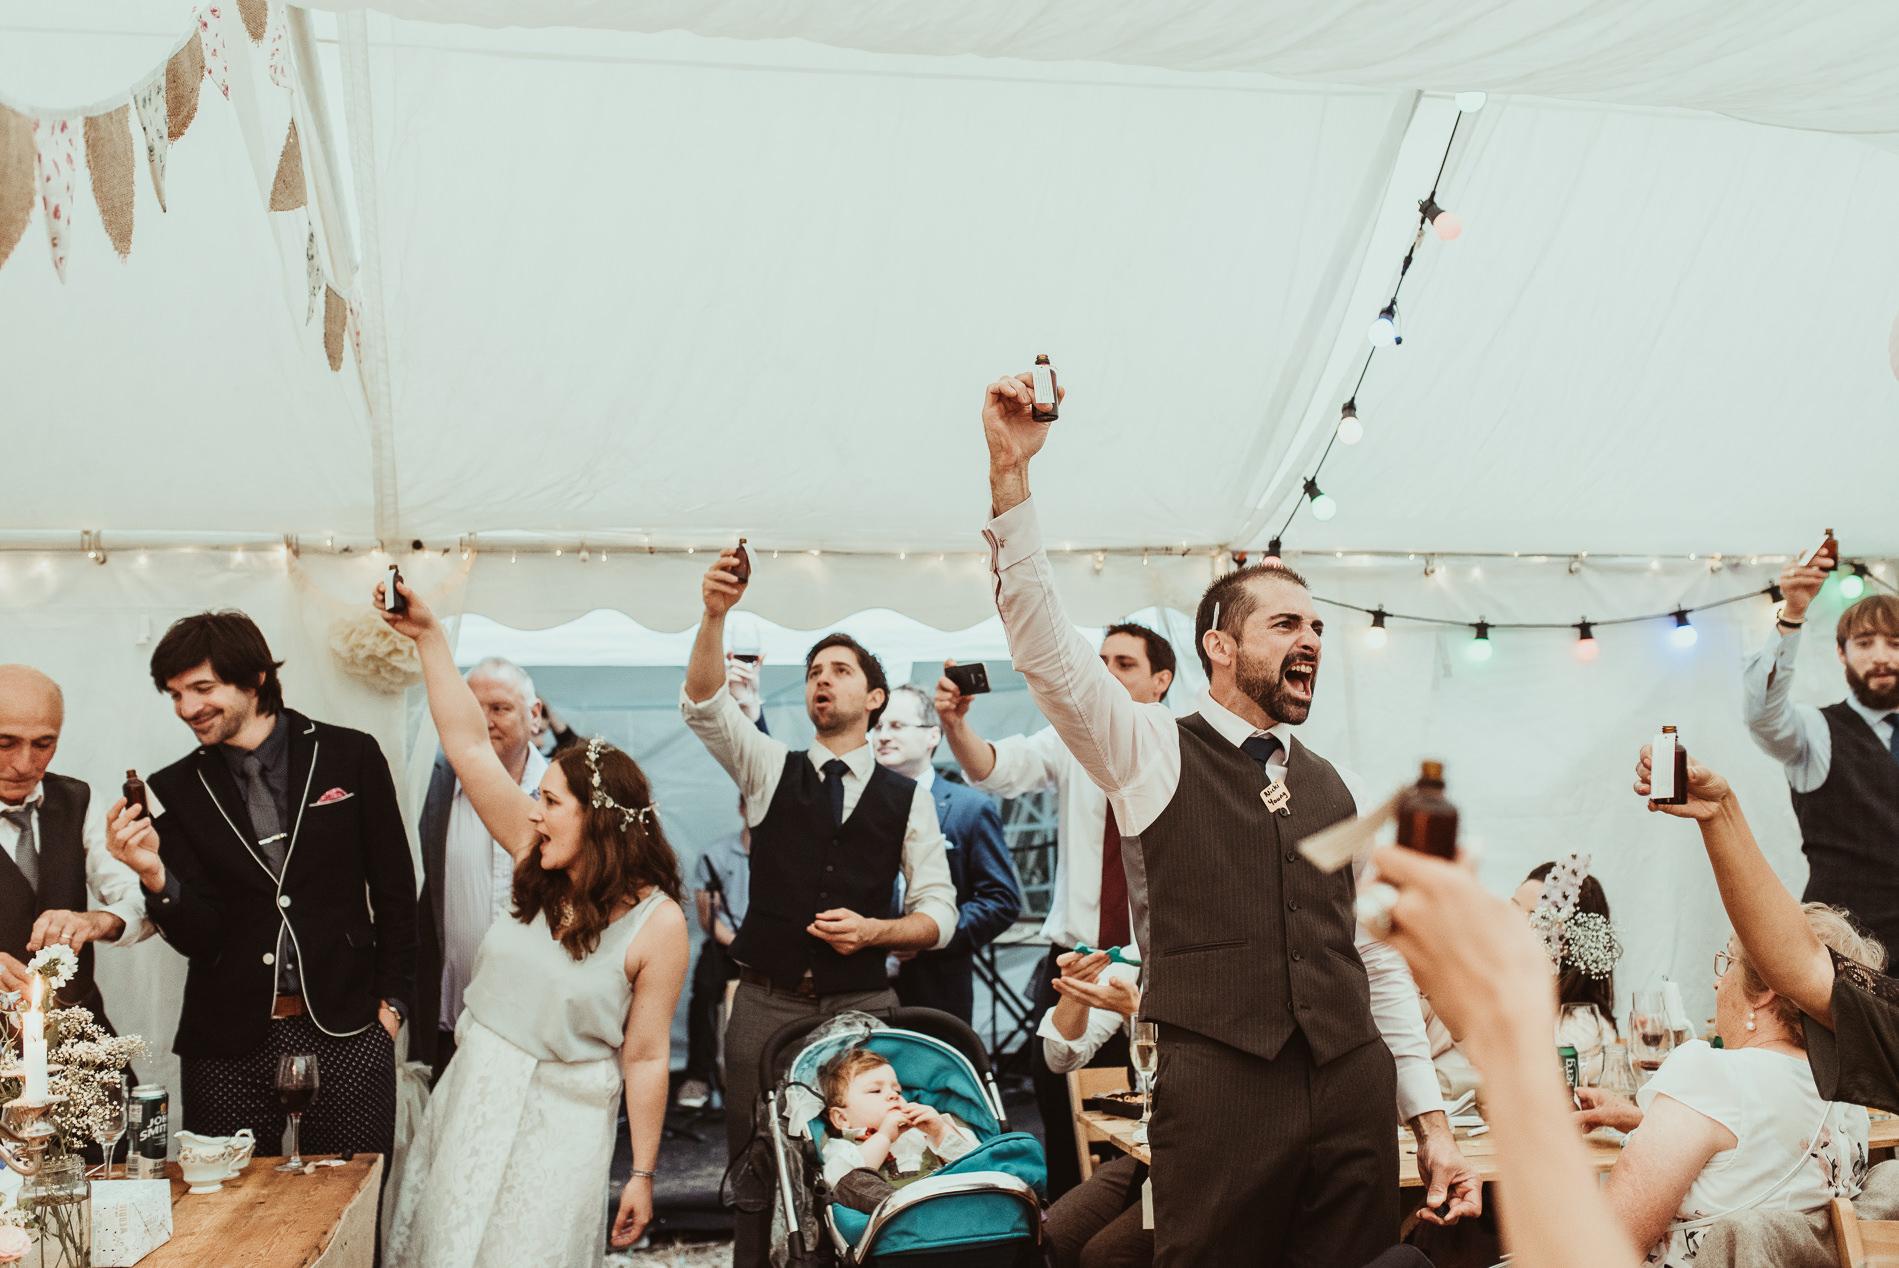 bohemian_wedding_lawshall_church_garden125